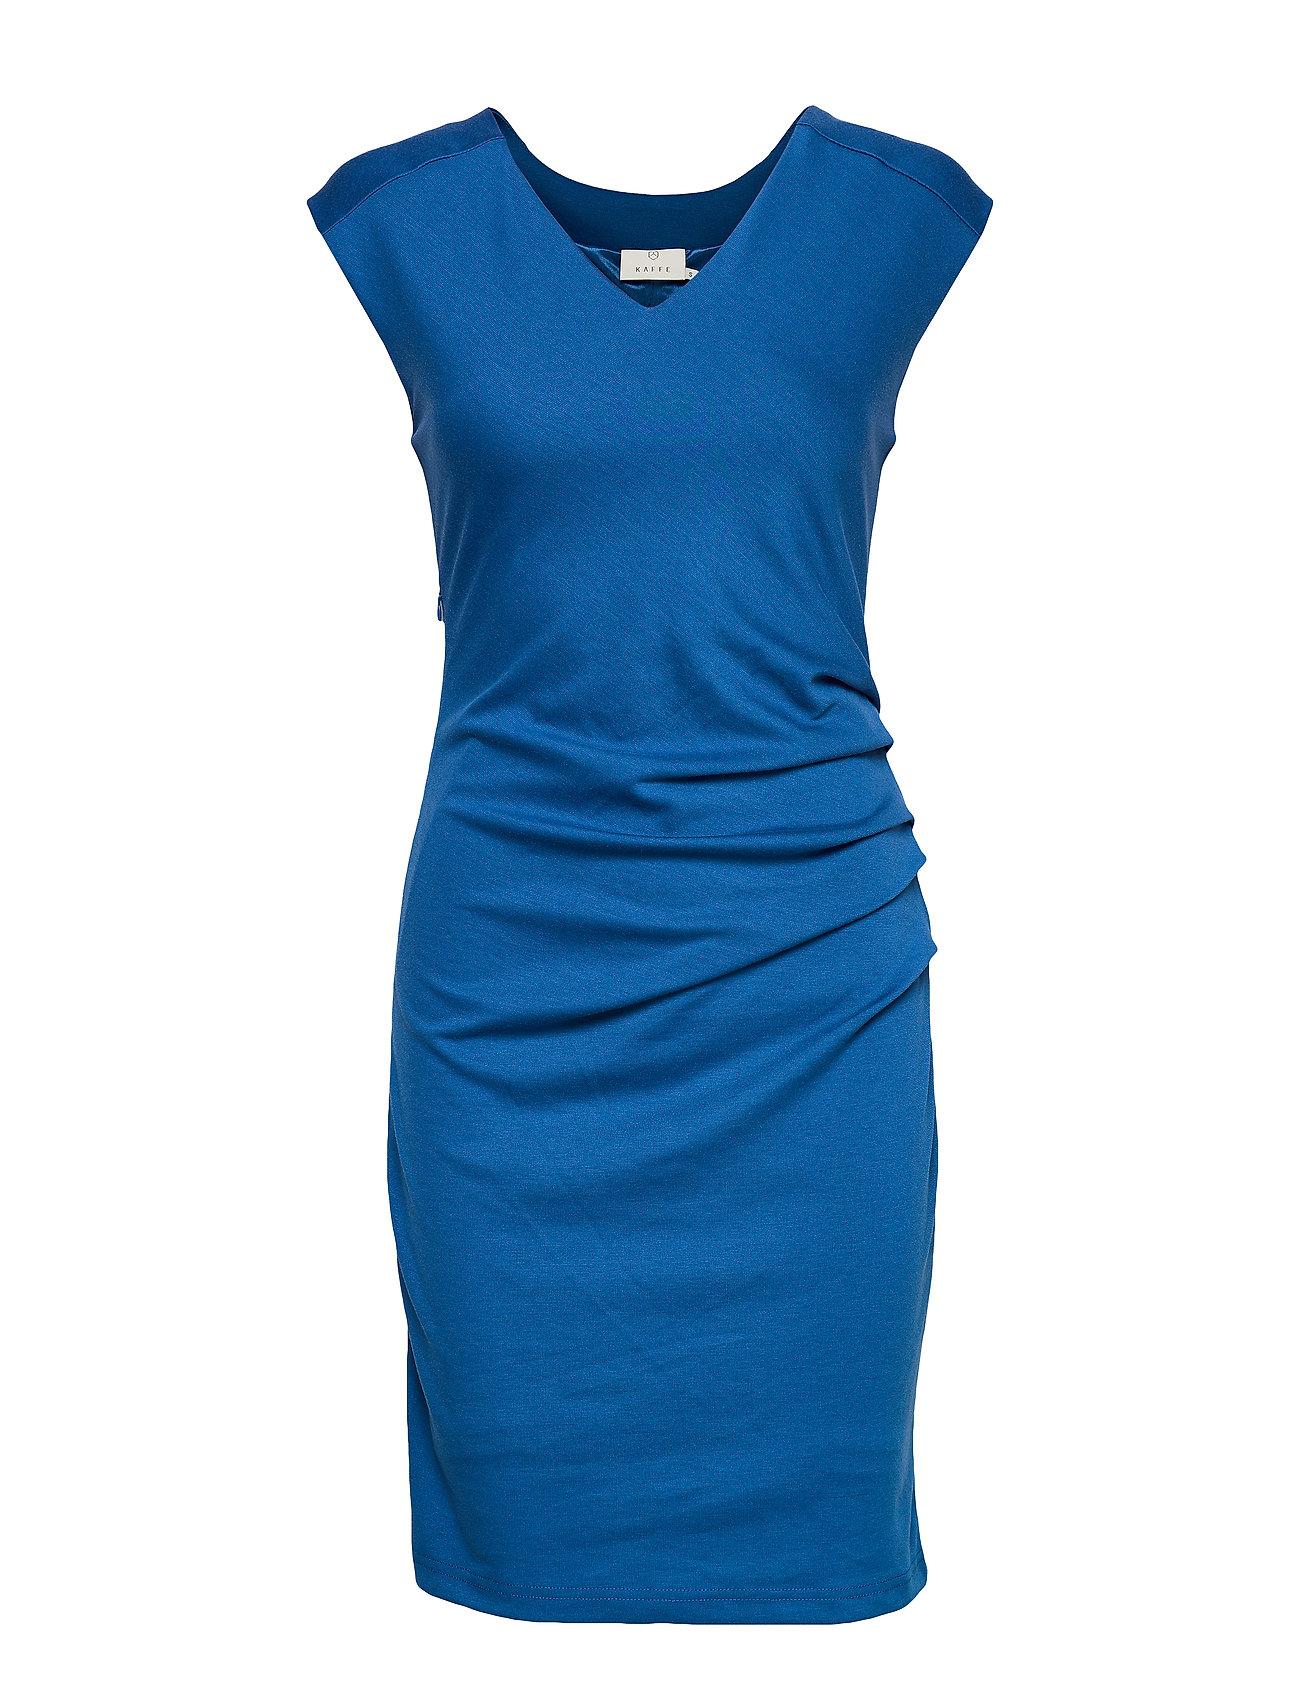 Kaffe India V-Neck Dress - CLASSIC BLUE